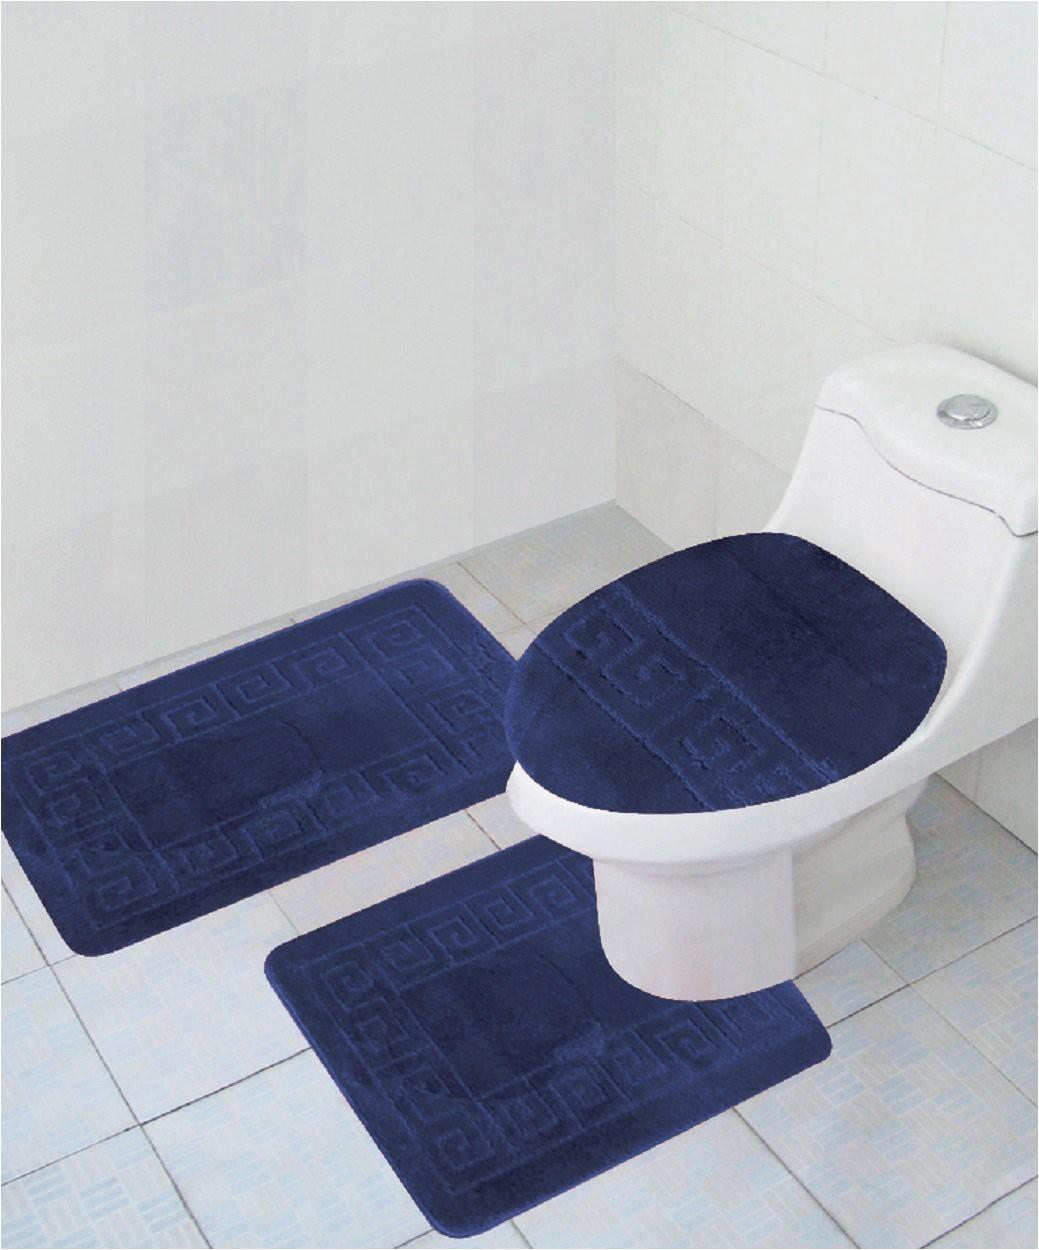 three piece navy bath rug odd shaped rugs microfiber bath mats bath rugs walmart 24 x 60 bath rug sears bath rugs blue rugs tar jcpenney rugs clearance kohls bath rugs bathroom rug sets bed bath an